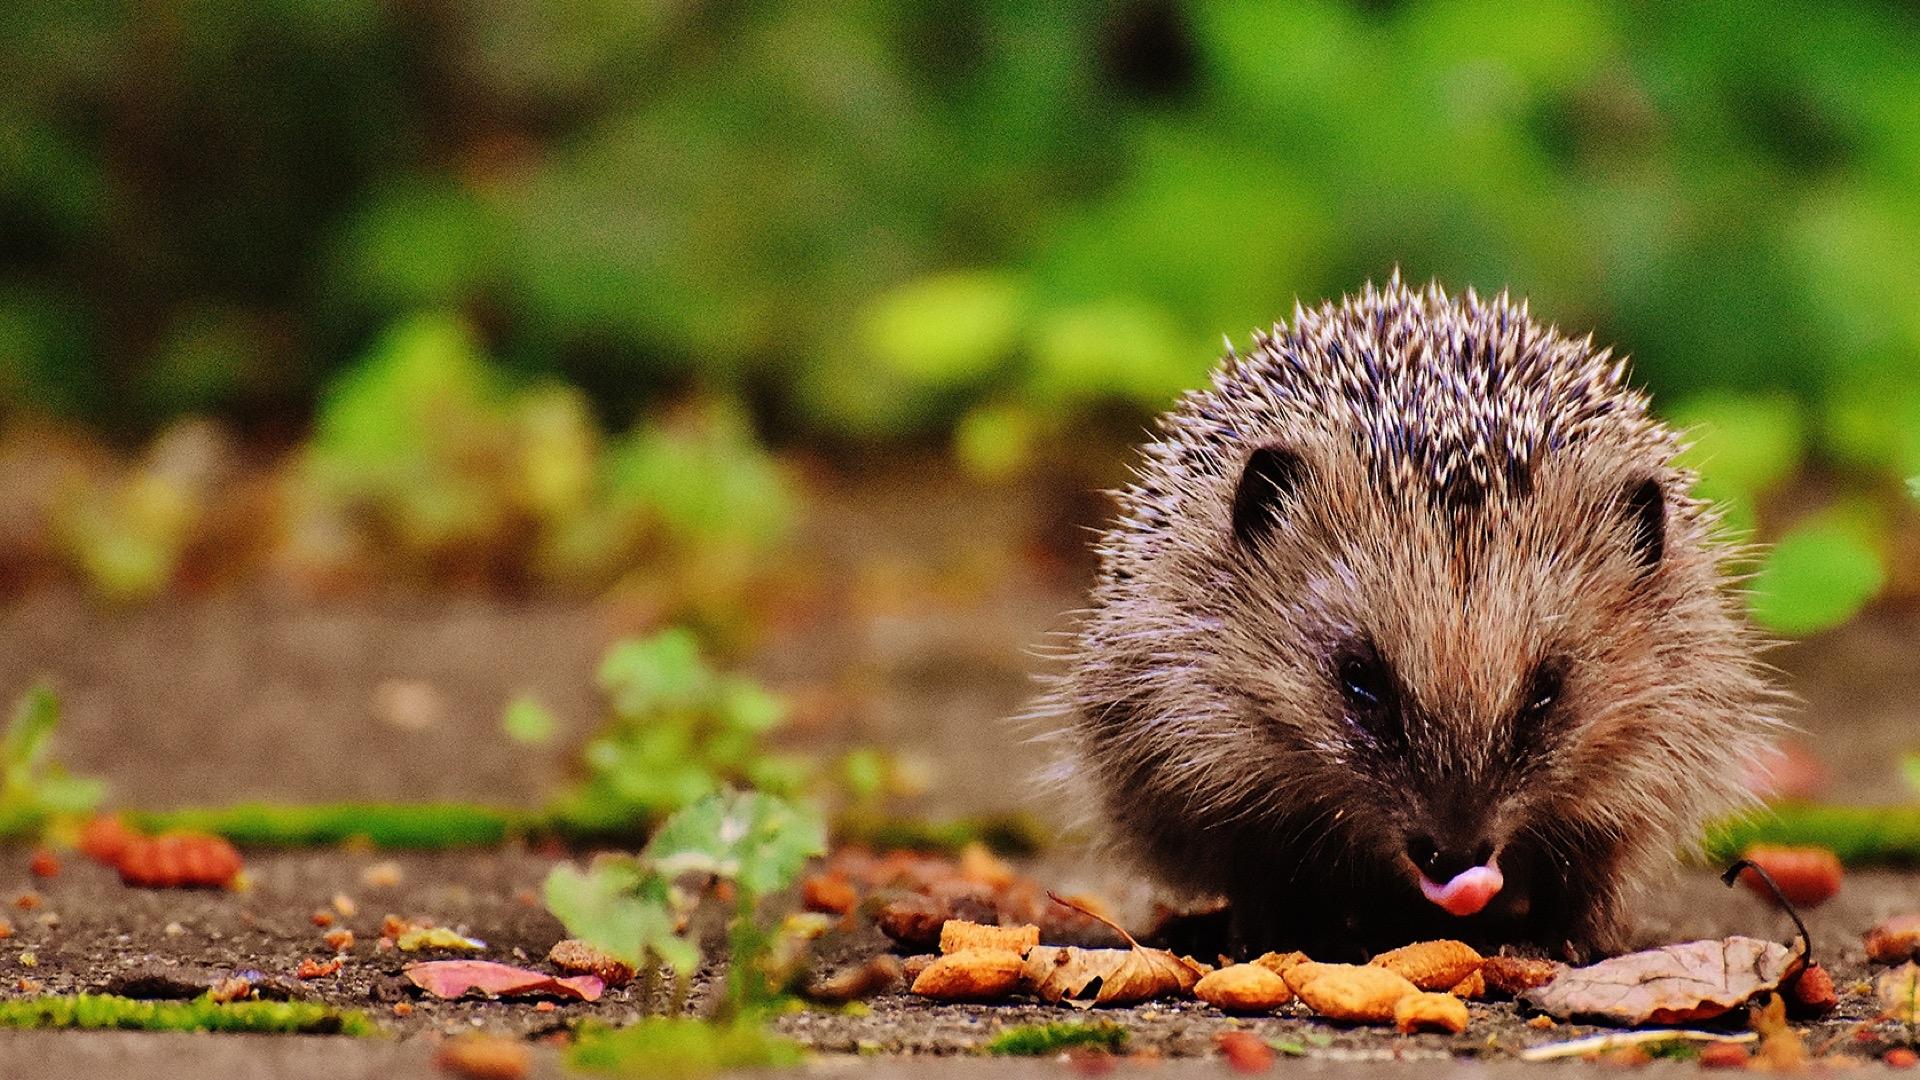 hedgehog licking its lips